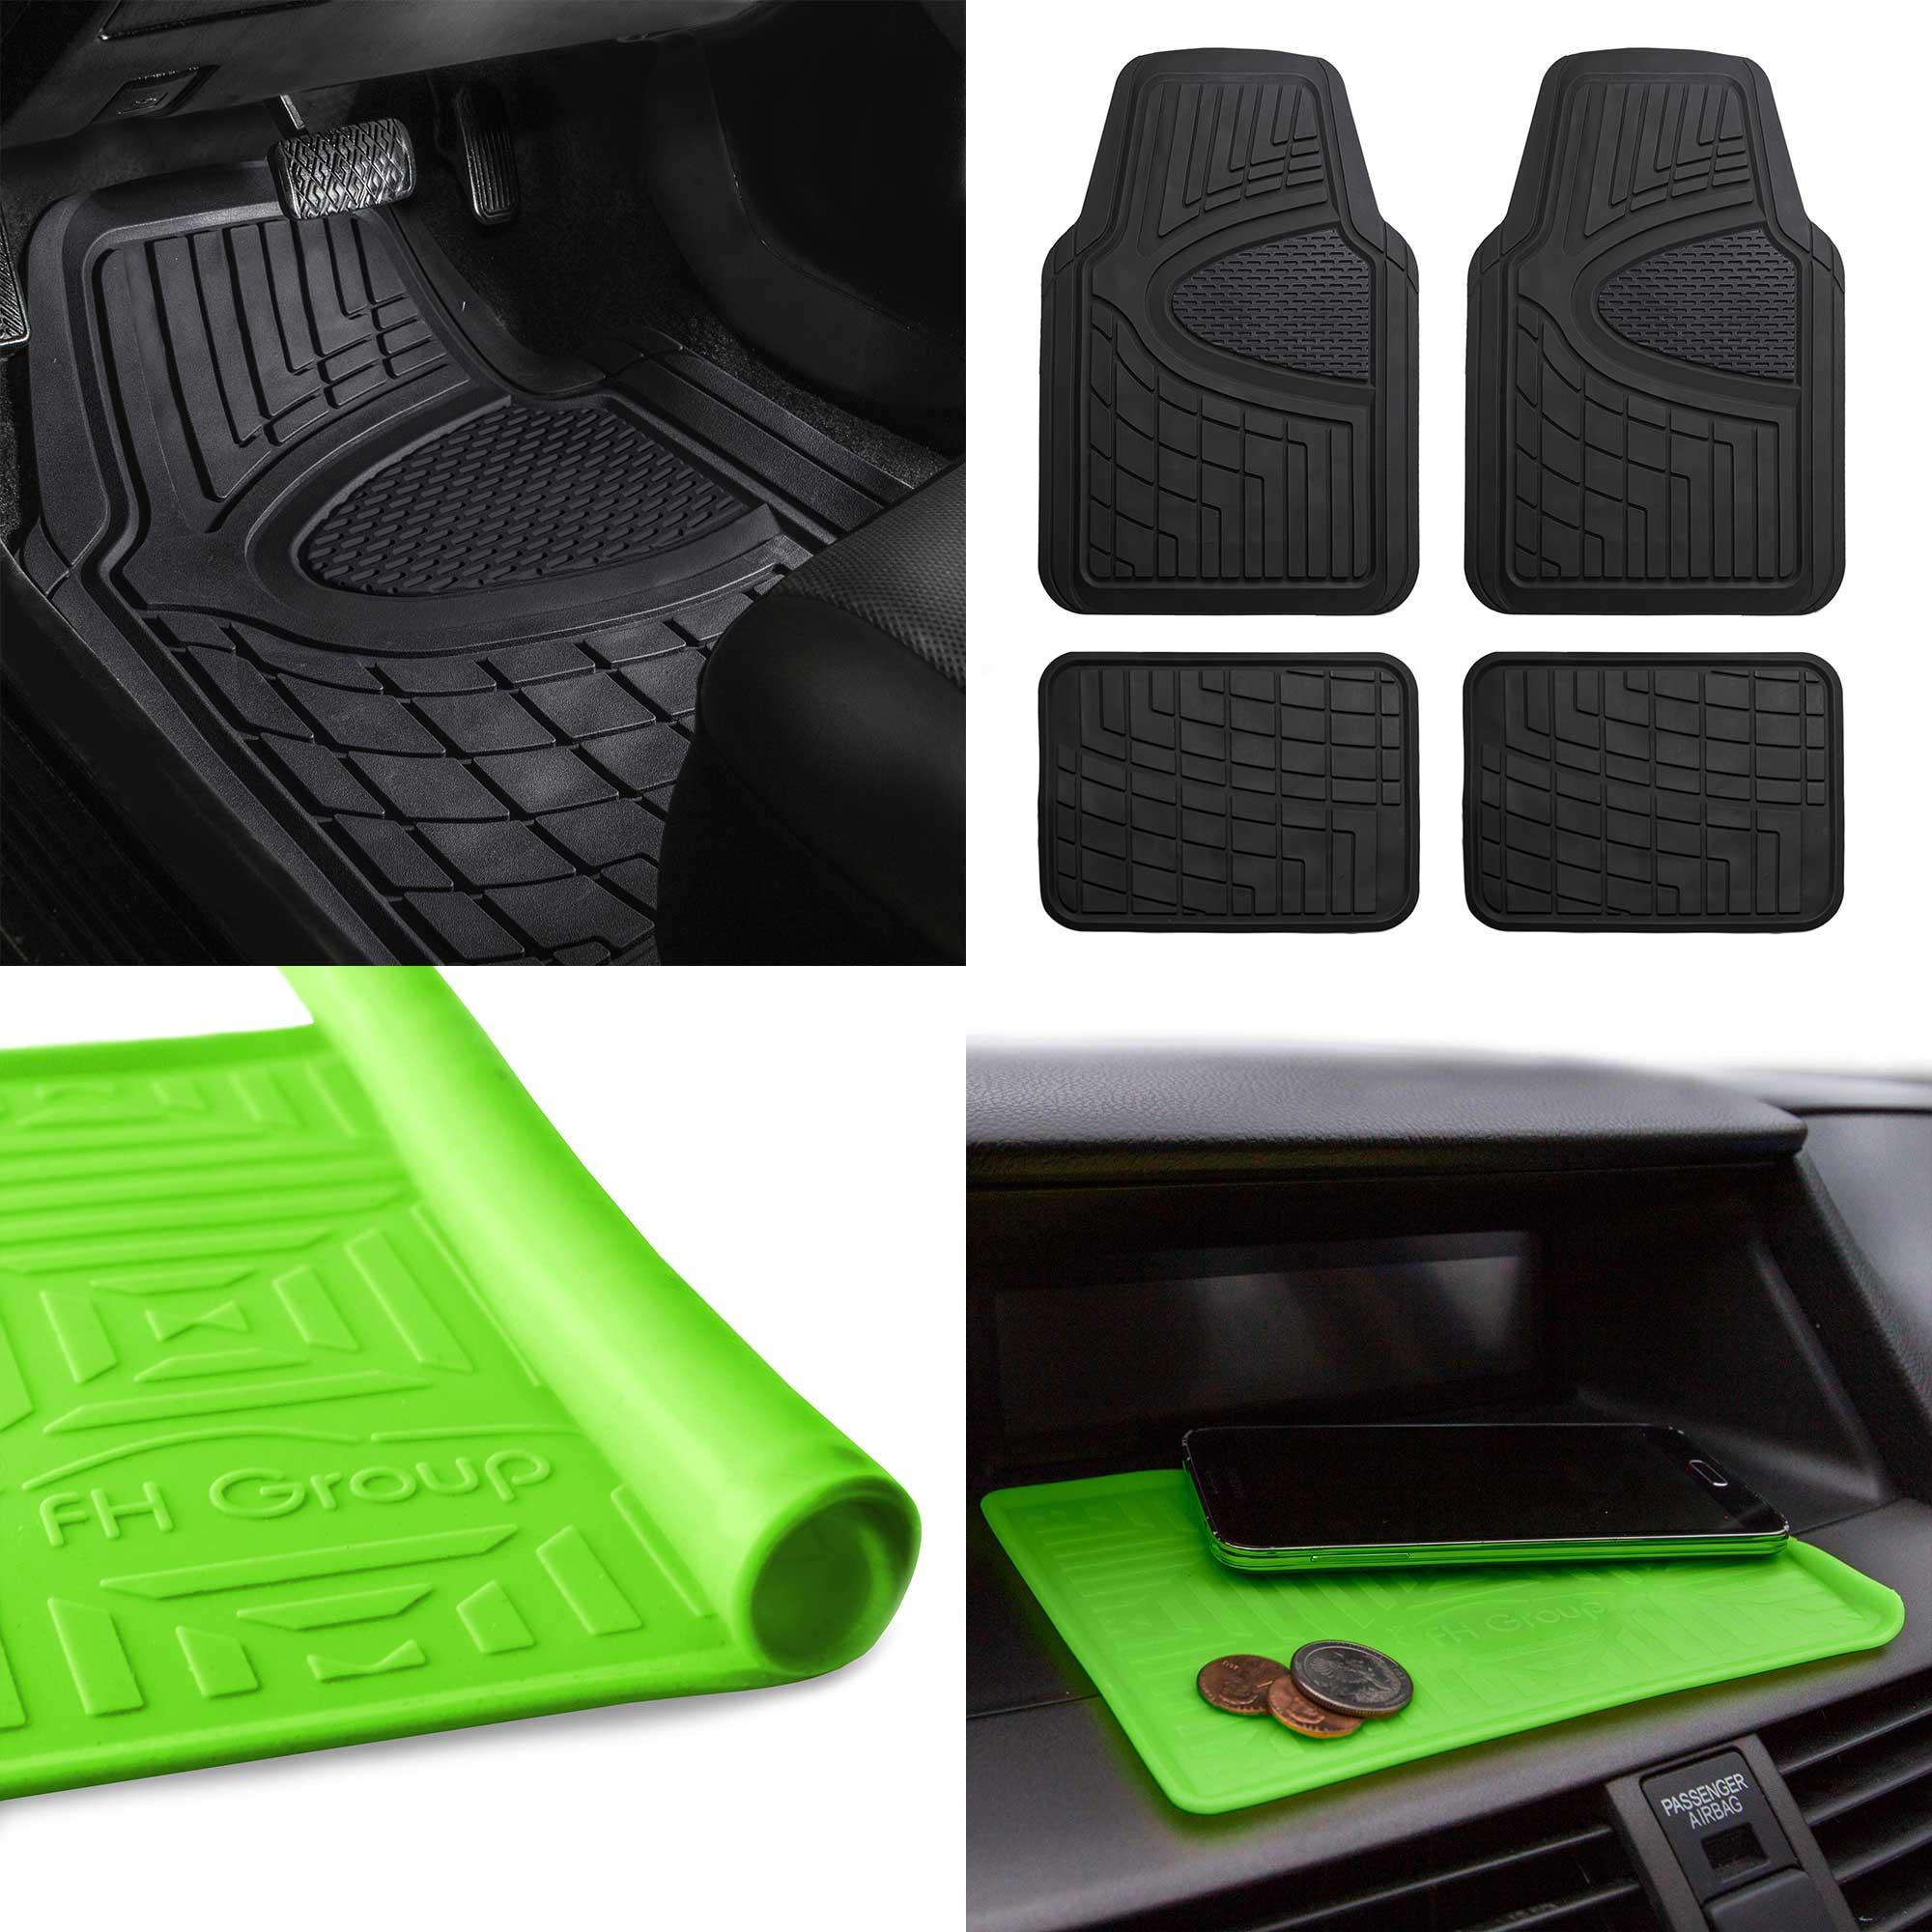 Car Floor Mats >> Details About All Weather Car Floor Mats For Auto Sedan Suv Custom Fit Black W Green Dash Mat